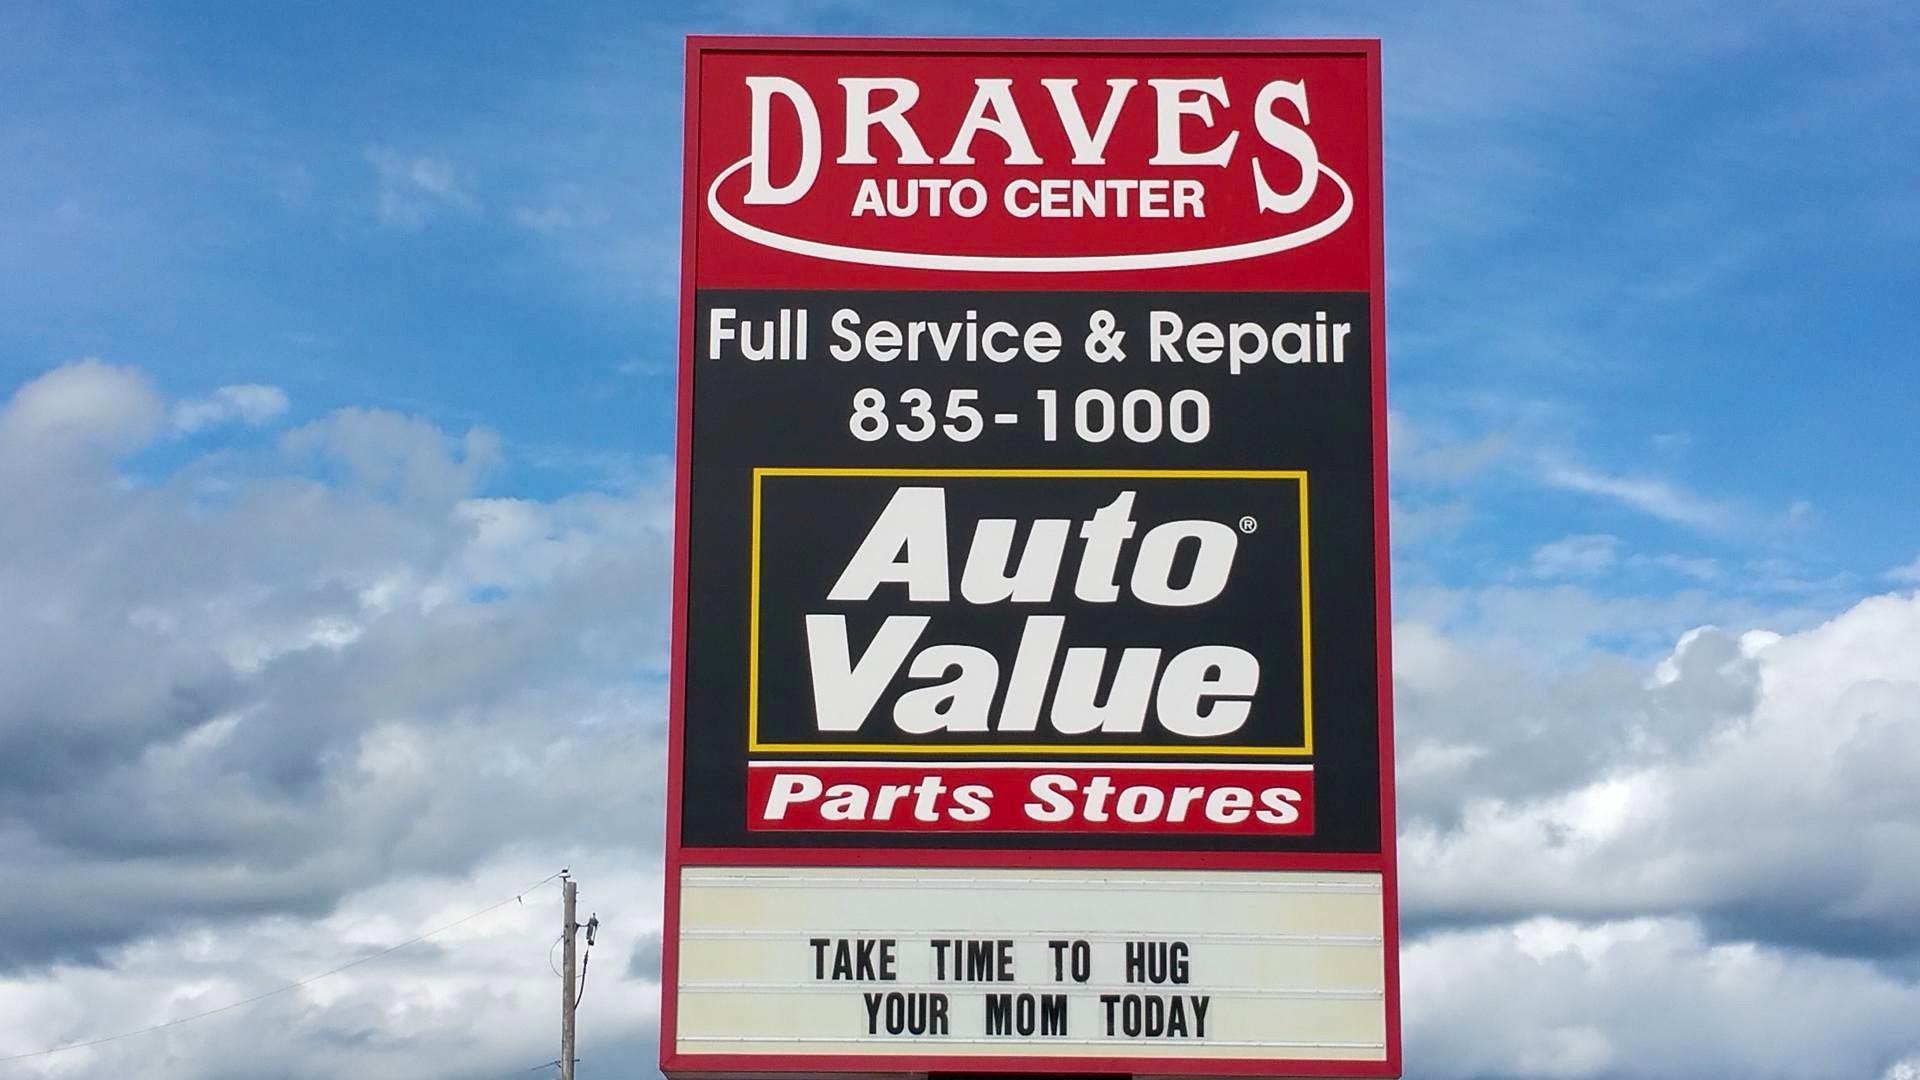 Draves Auto Center image 5